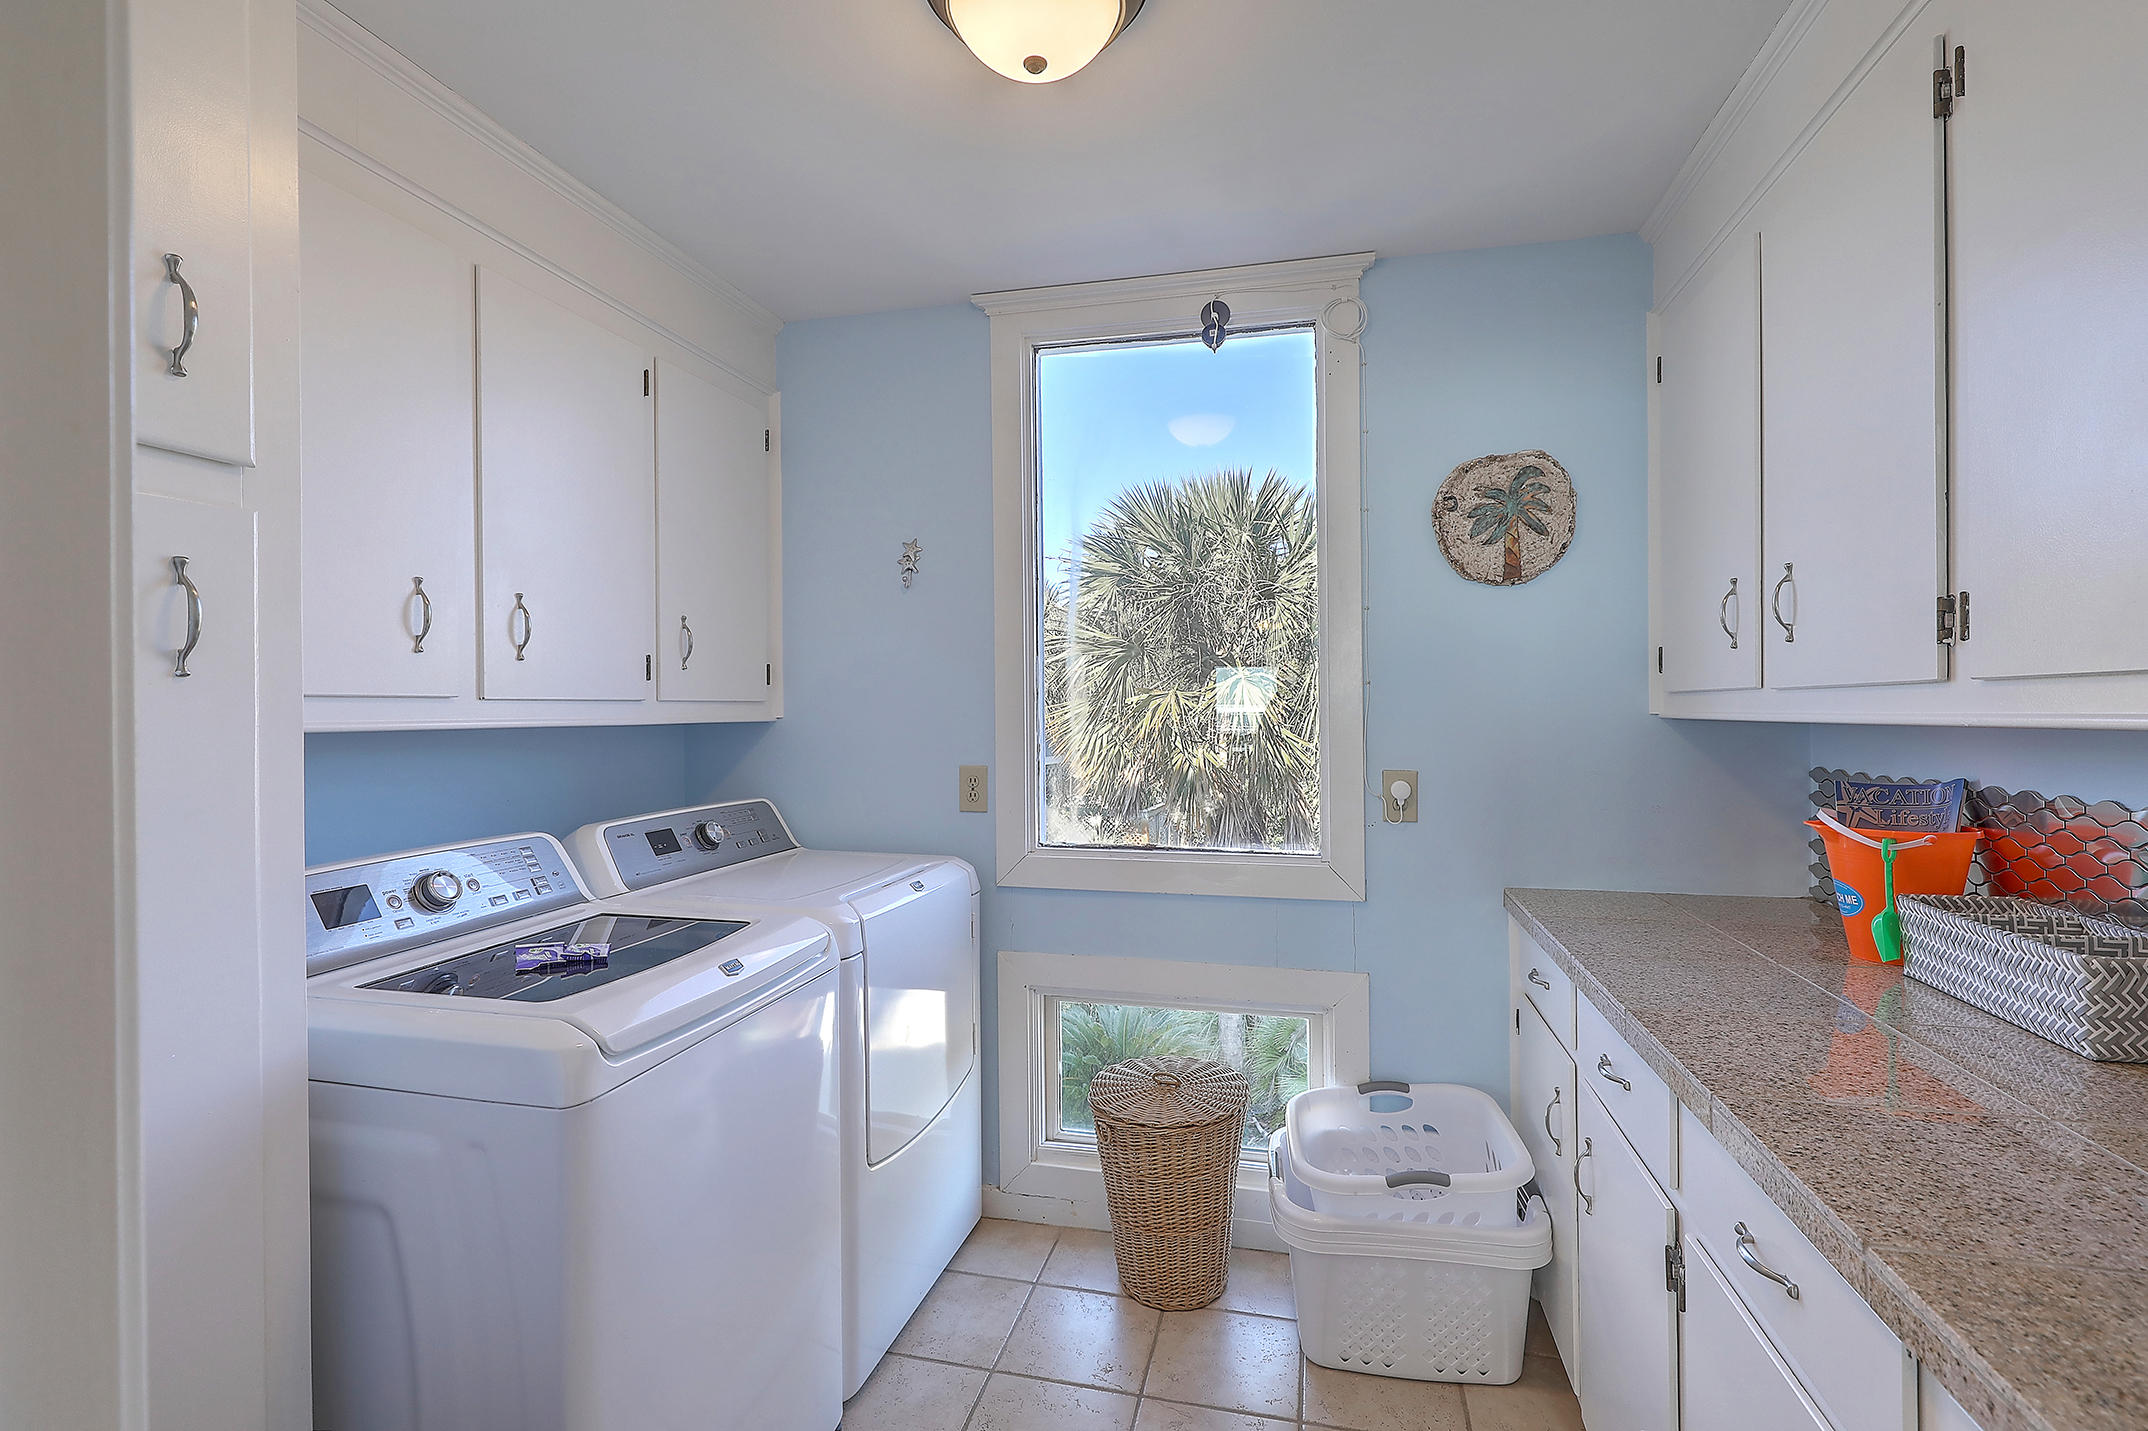 Wild Dunes Homes For Sale - 14 Beachwood East, Isle of Palms, SC - 10